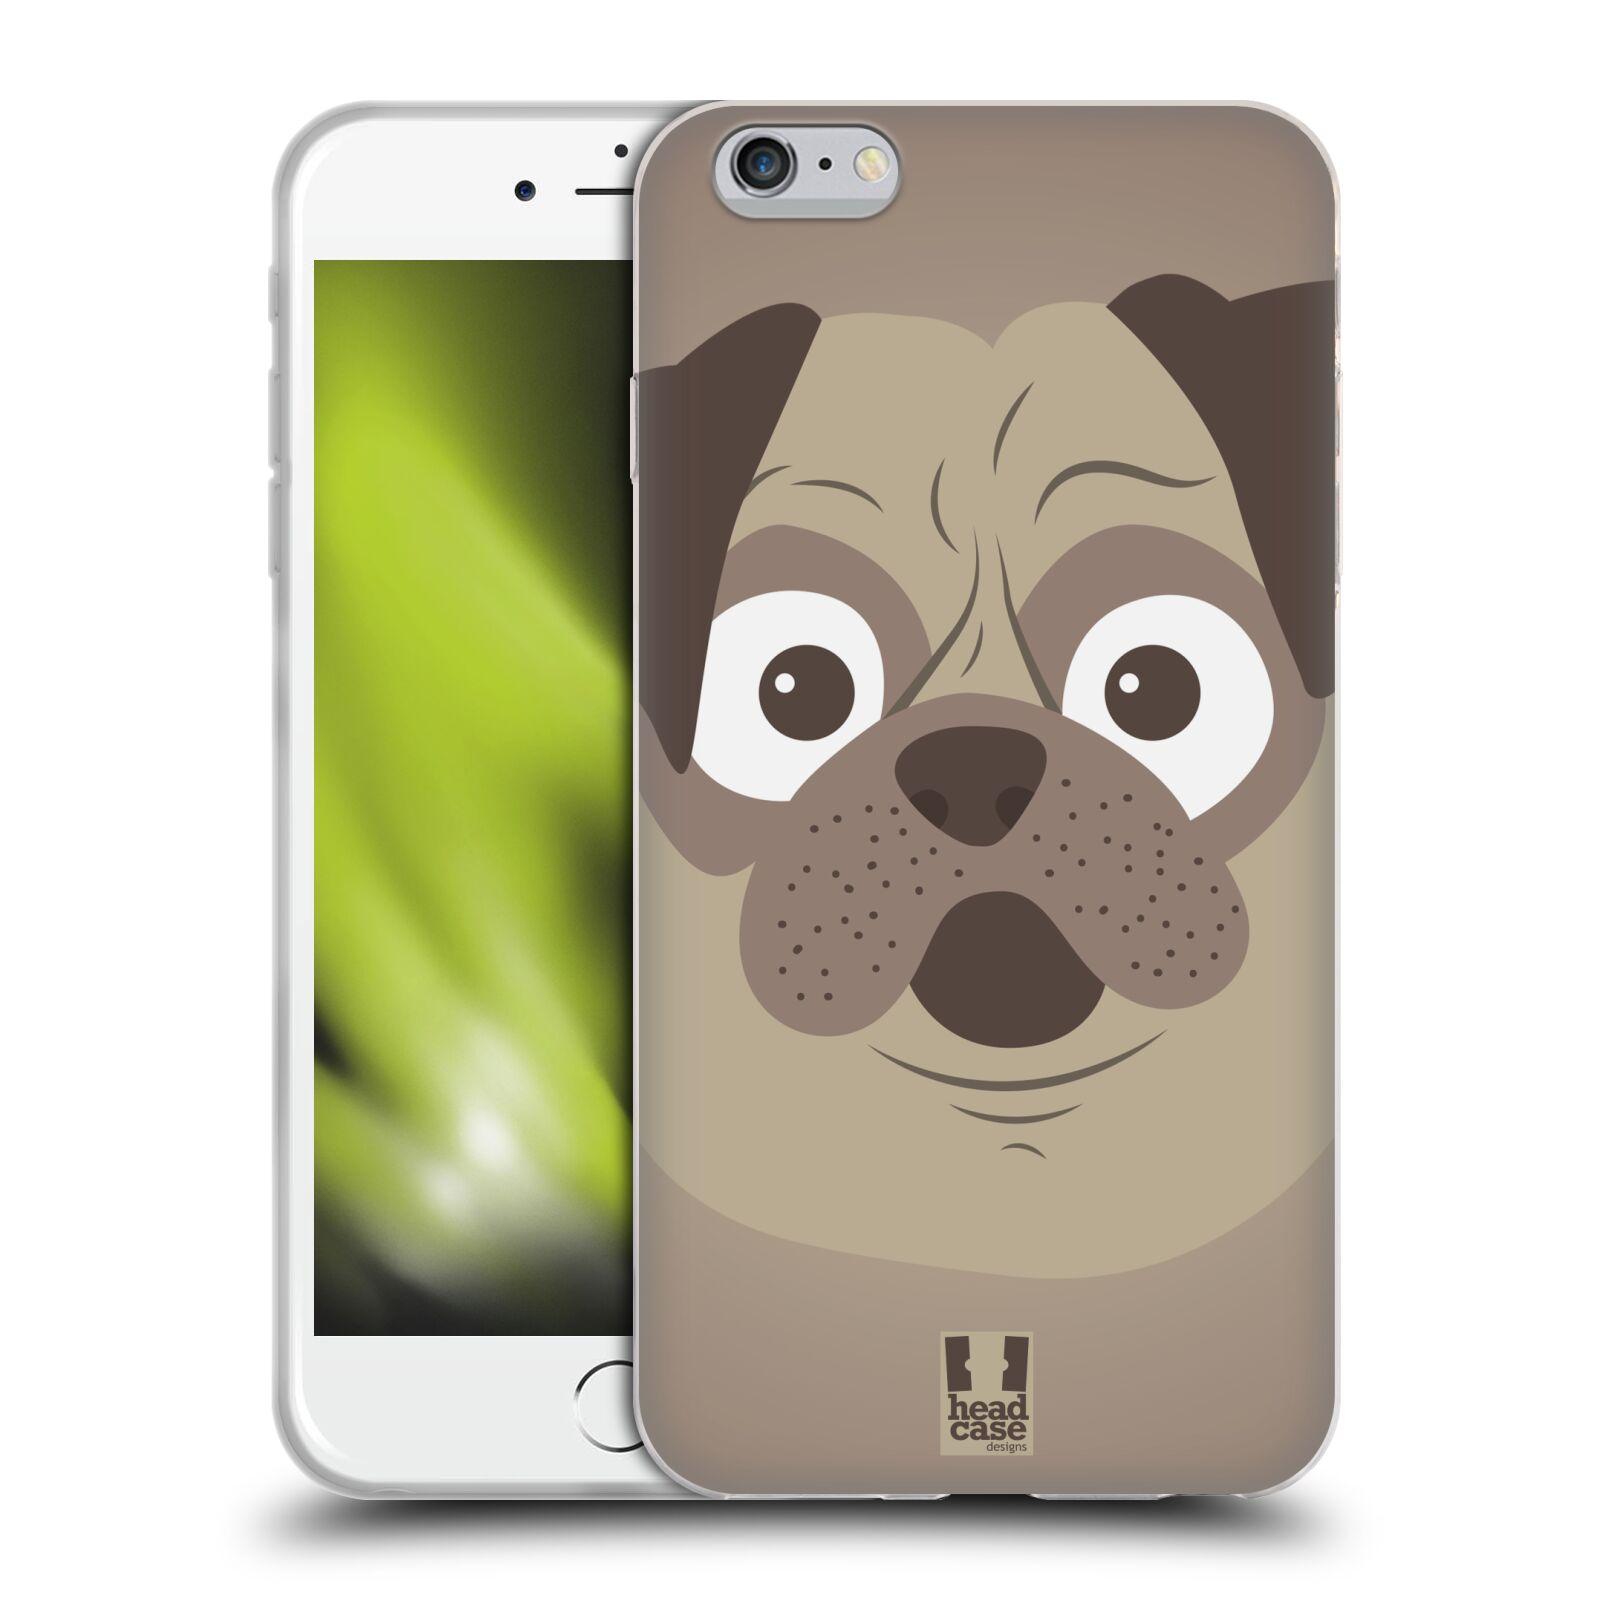 HEAD CASE silikonový obal na mobil Apple Iphone 6 PLUS/ 6S PLUS vzor Cartoon Karikatura barevná kreslená zvířátka pes mopsík